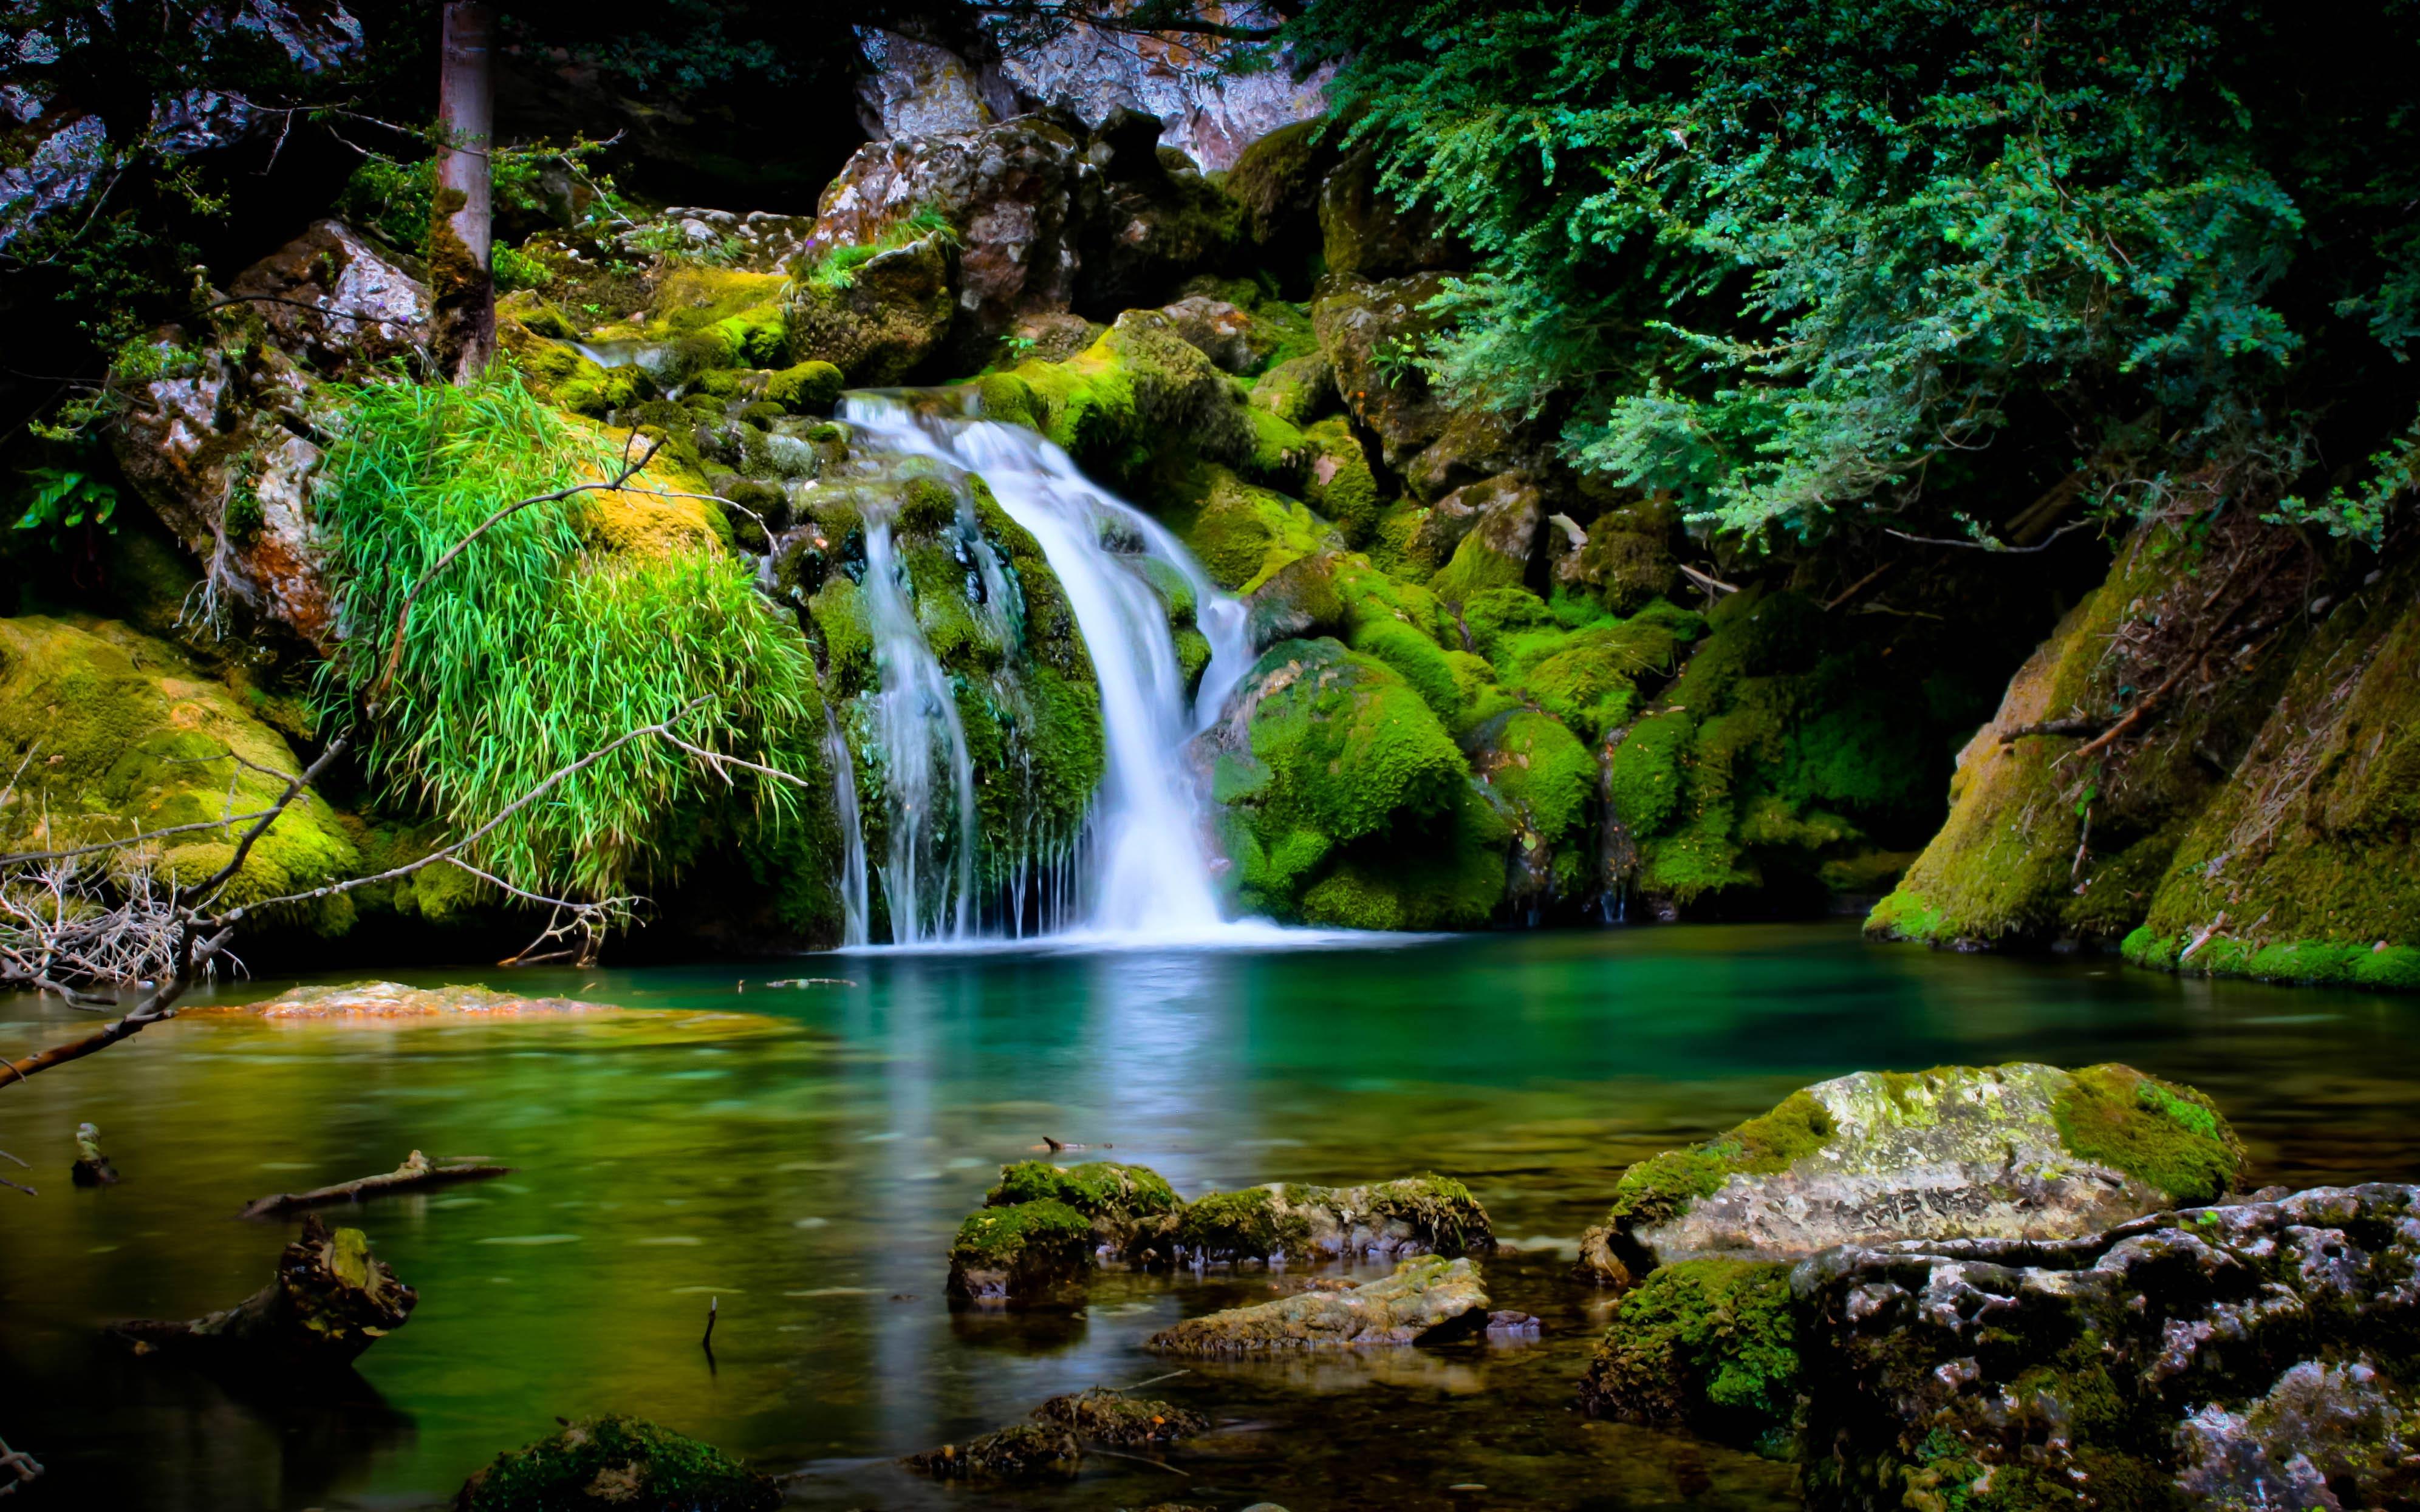 Waterfall 728 Wallpaper Wide Screen Wallpaper 1080p2K4K 3984x2490